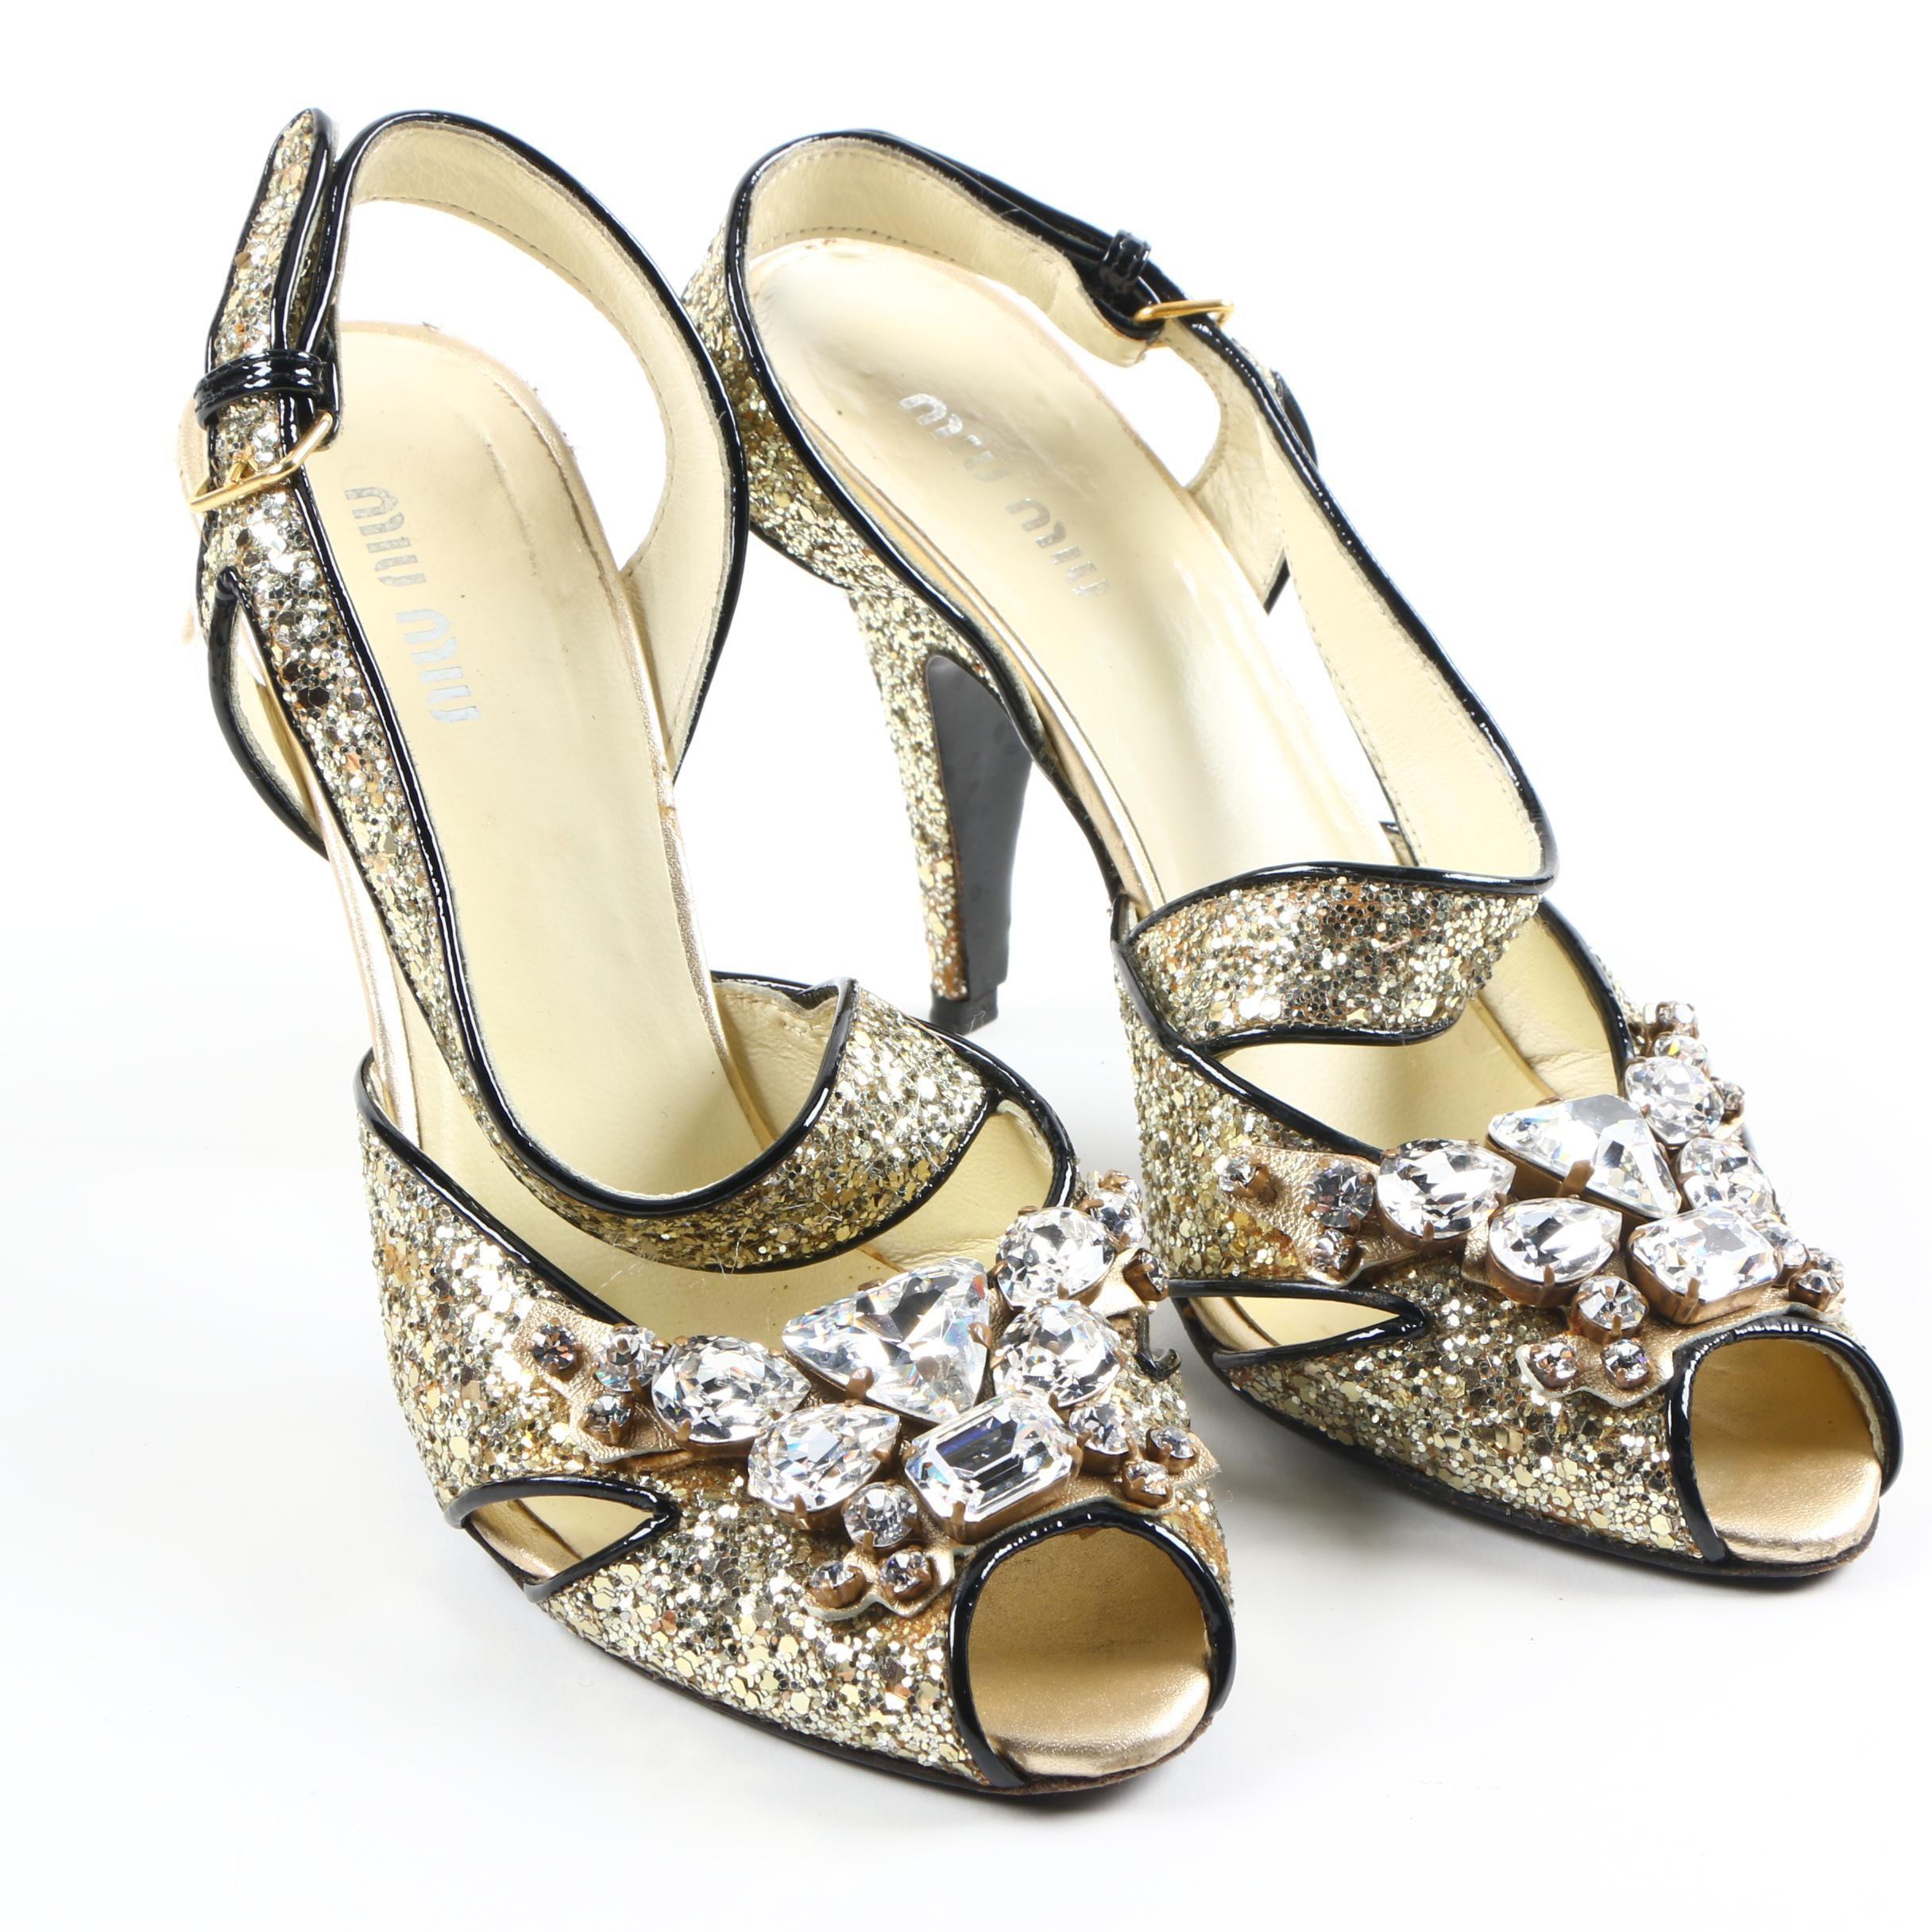 Miu Miu Embellished Glitter Peep Toe Heels